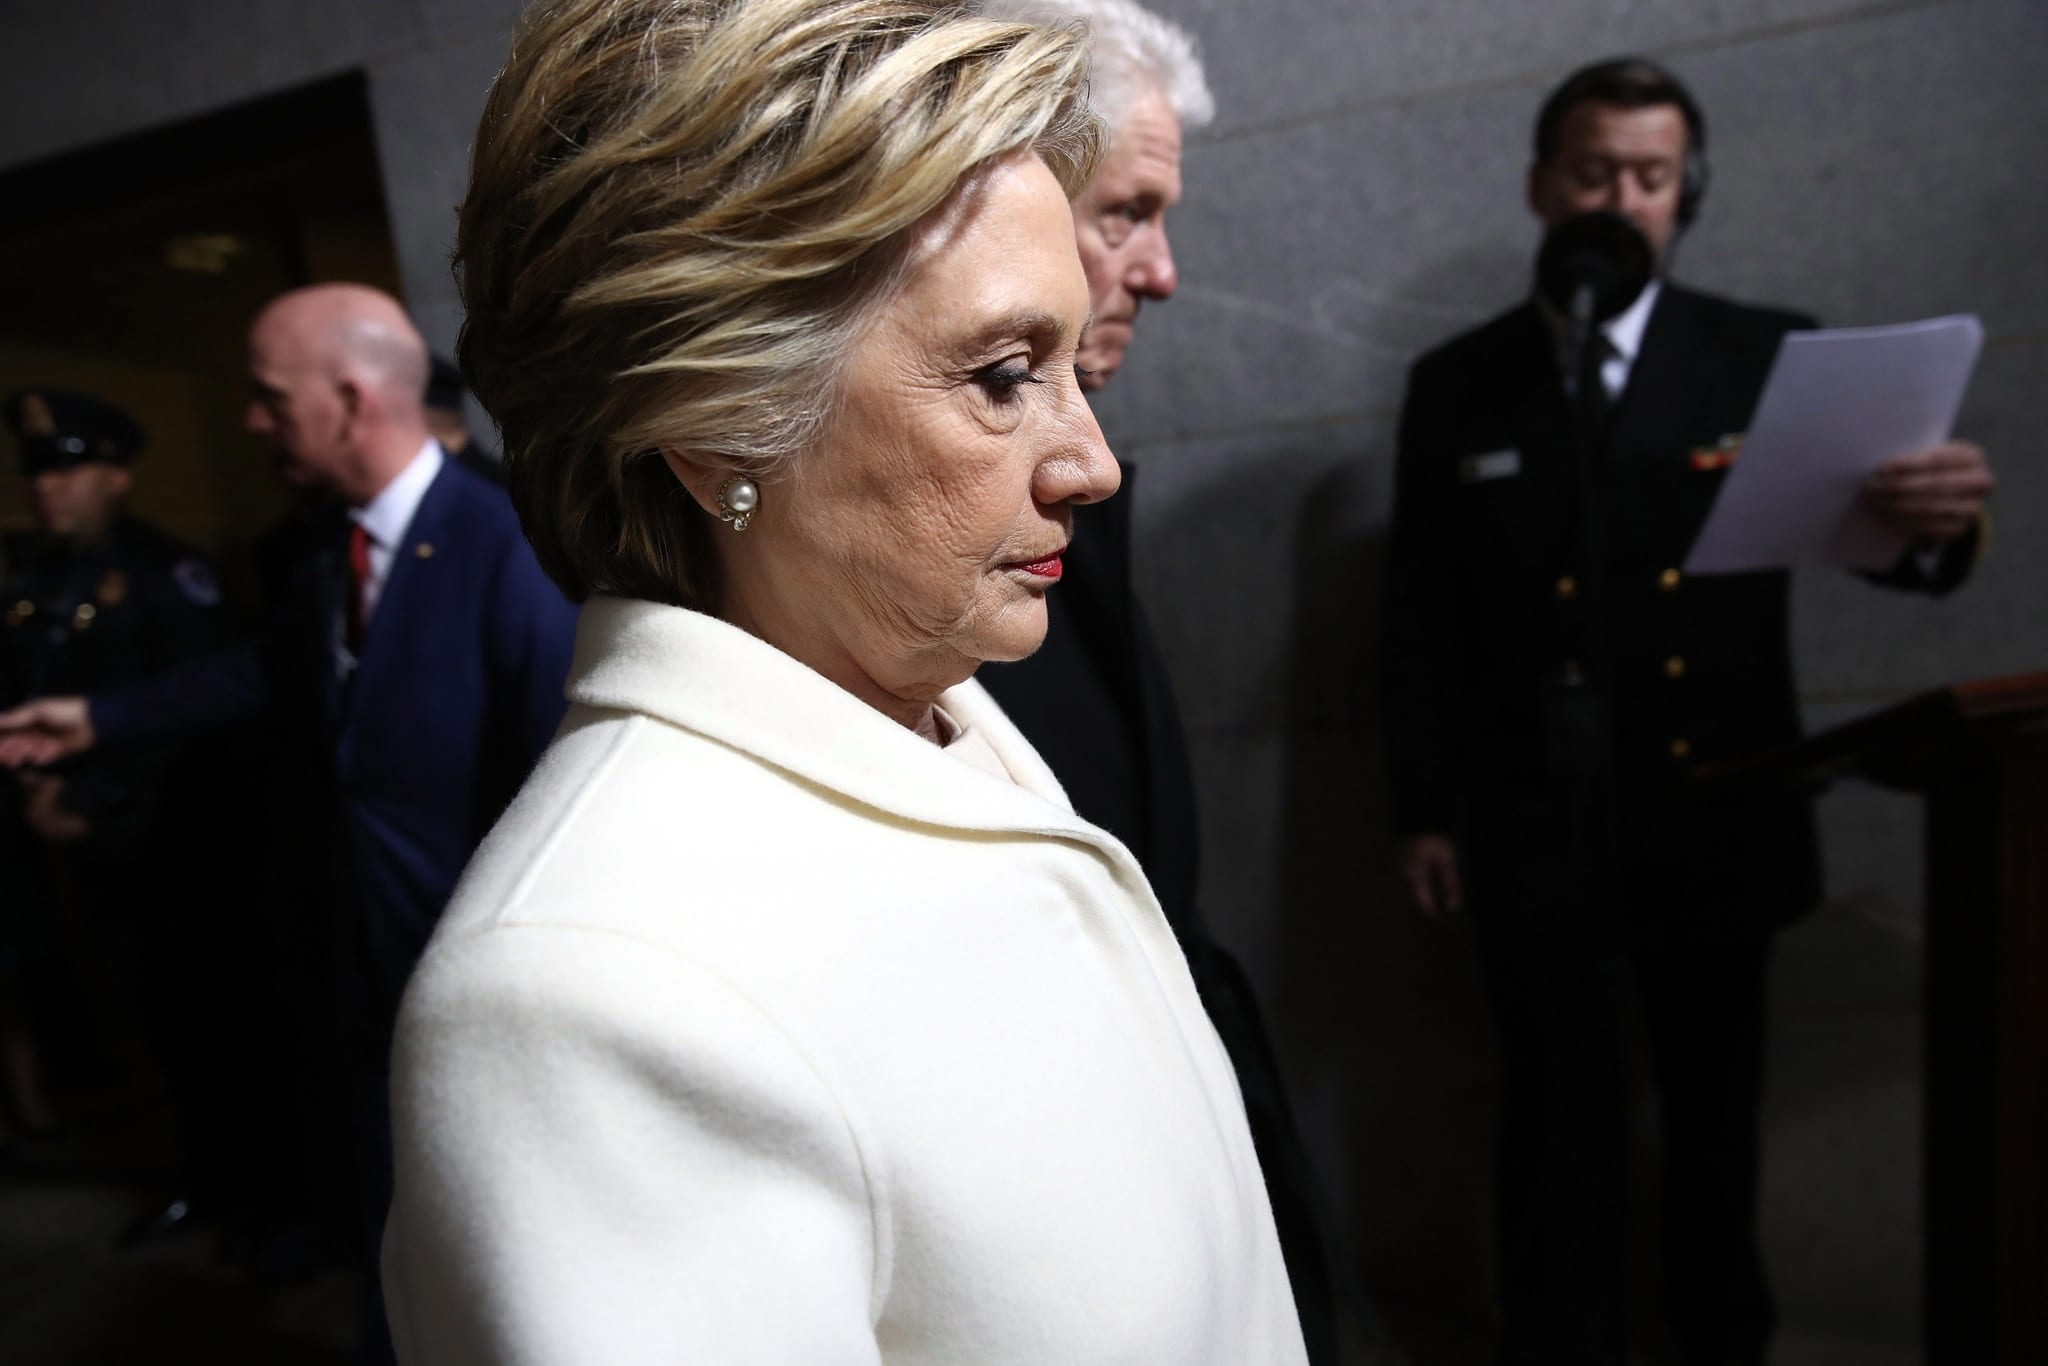 Clinton diz que Sanders prejudicou-a junto dos mais progressistas ao ligá-la aos grandes interesses de Wall Street